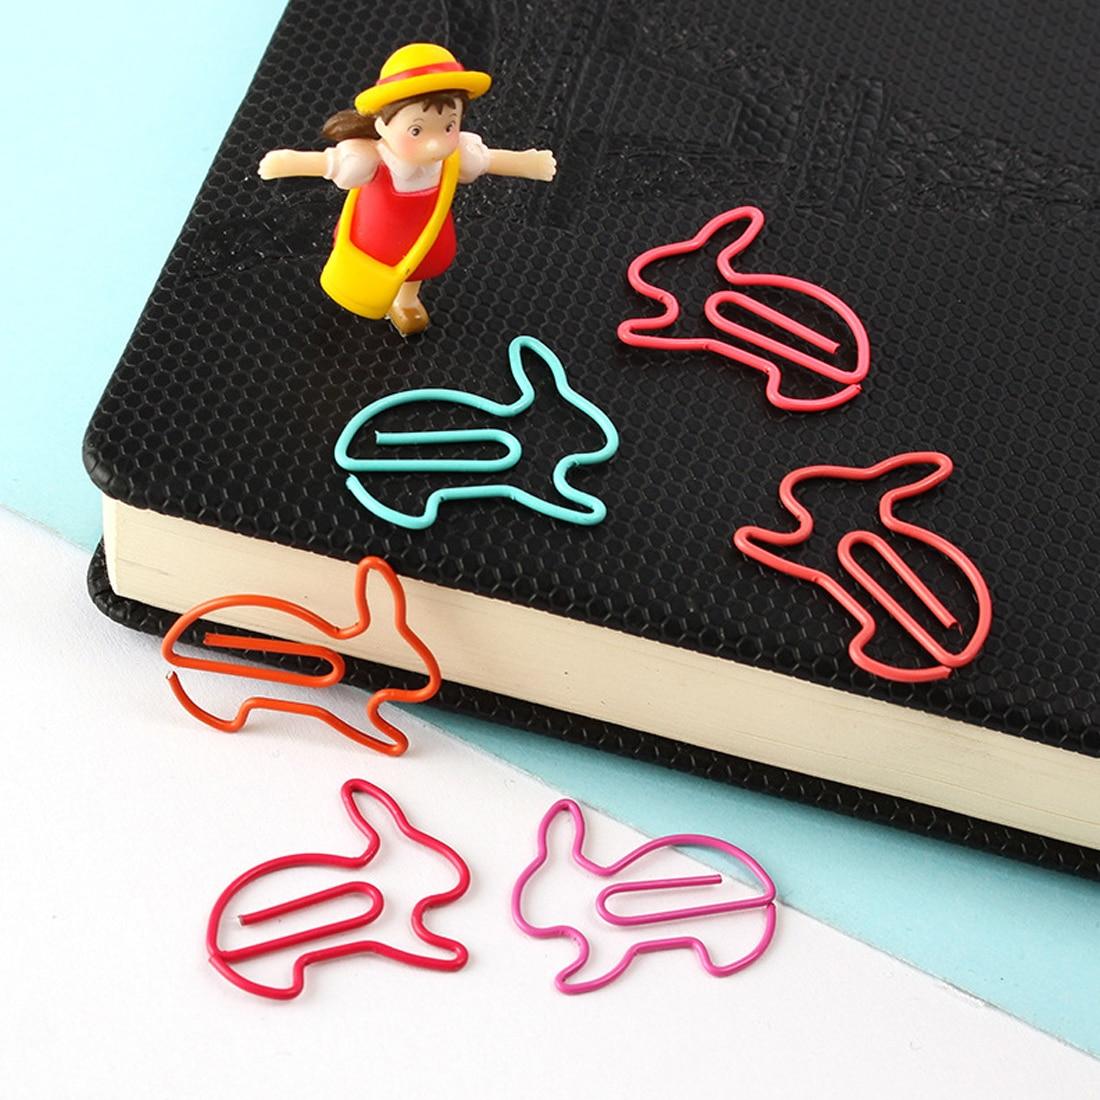 FangNymph Creative 10Pcs Rabbit Bookmark Planner Paper Clip Metal Material Segnalibri For Book Stationery School Office Supplies